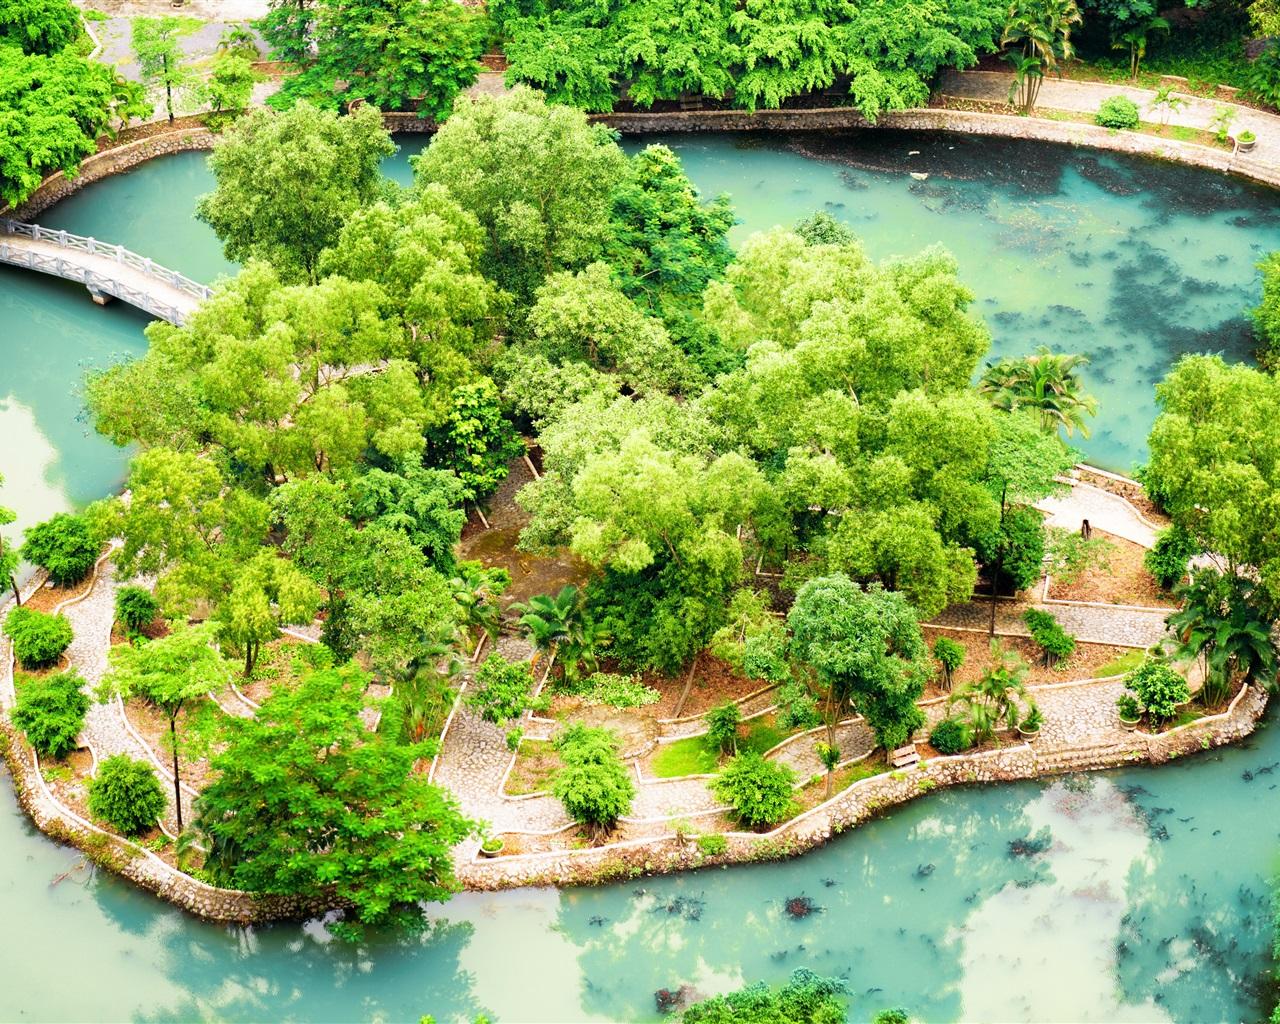 Download wallpaper 1280x1024 vietnam ninh binh tropical for Garden pool hanoi